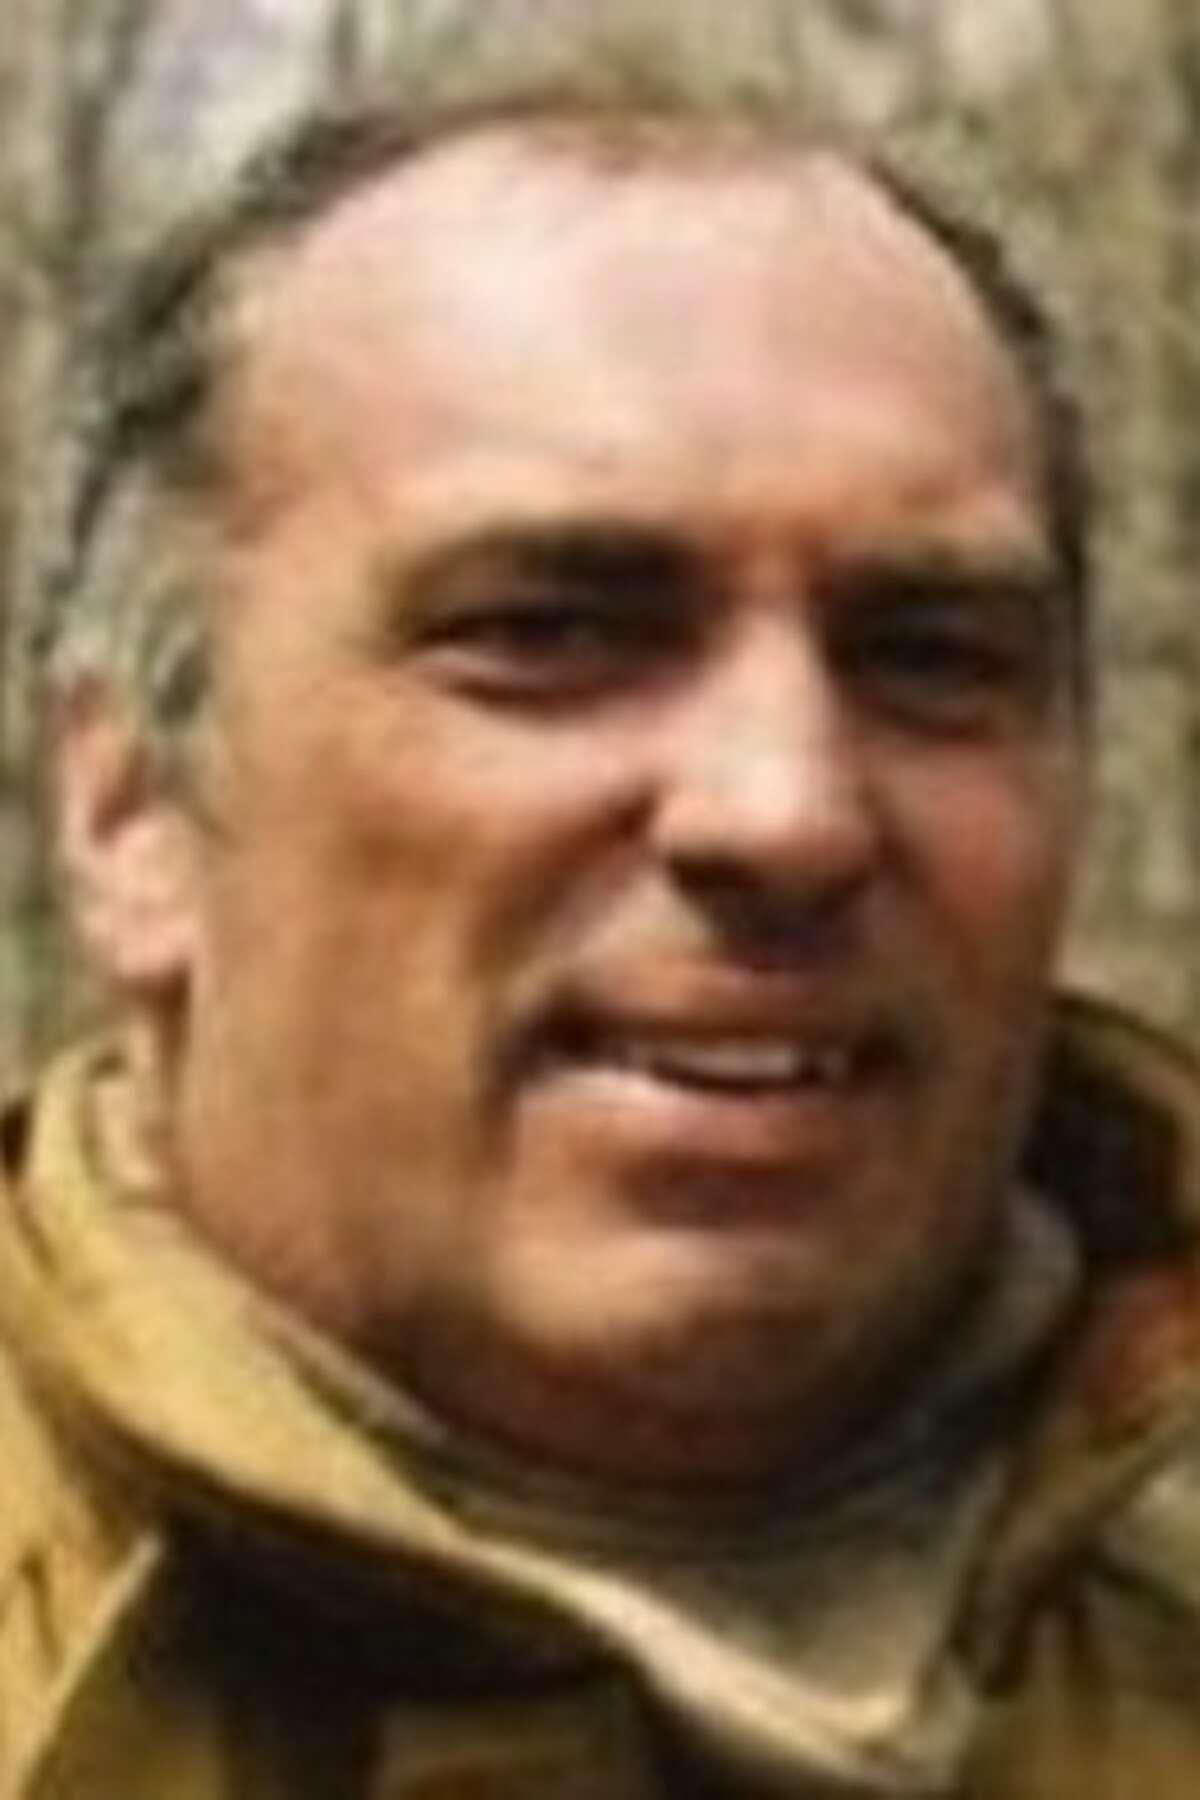 Easton Fire Lt. Russell Neary